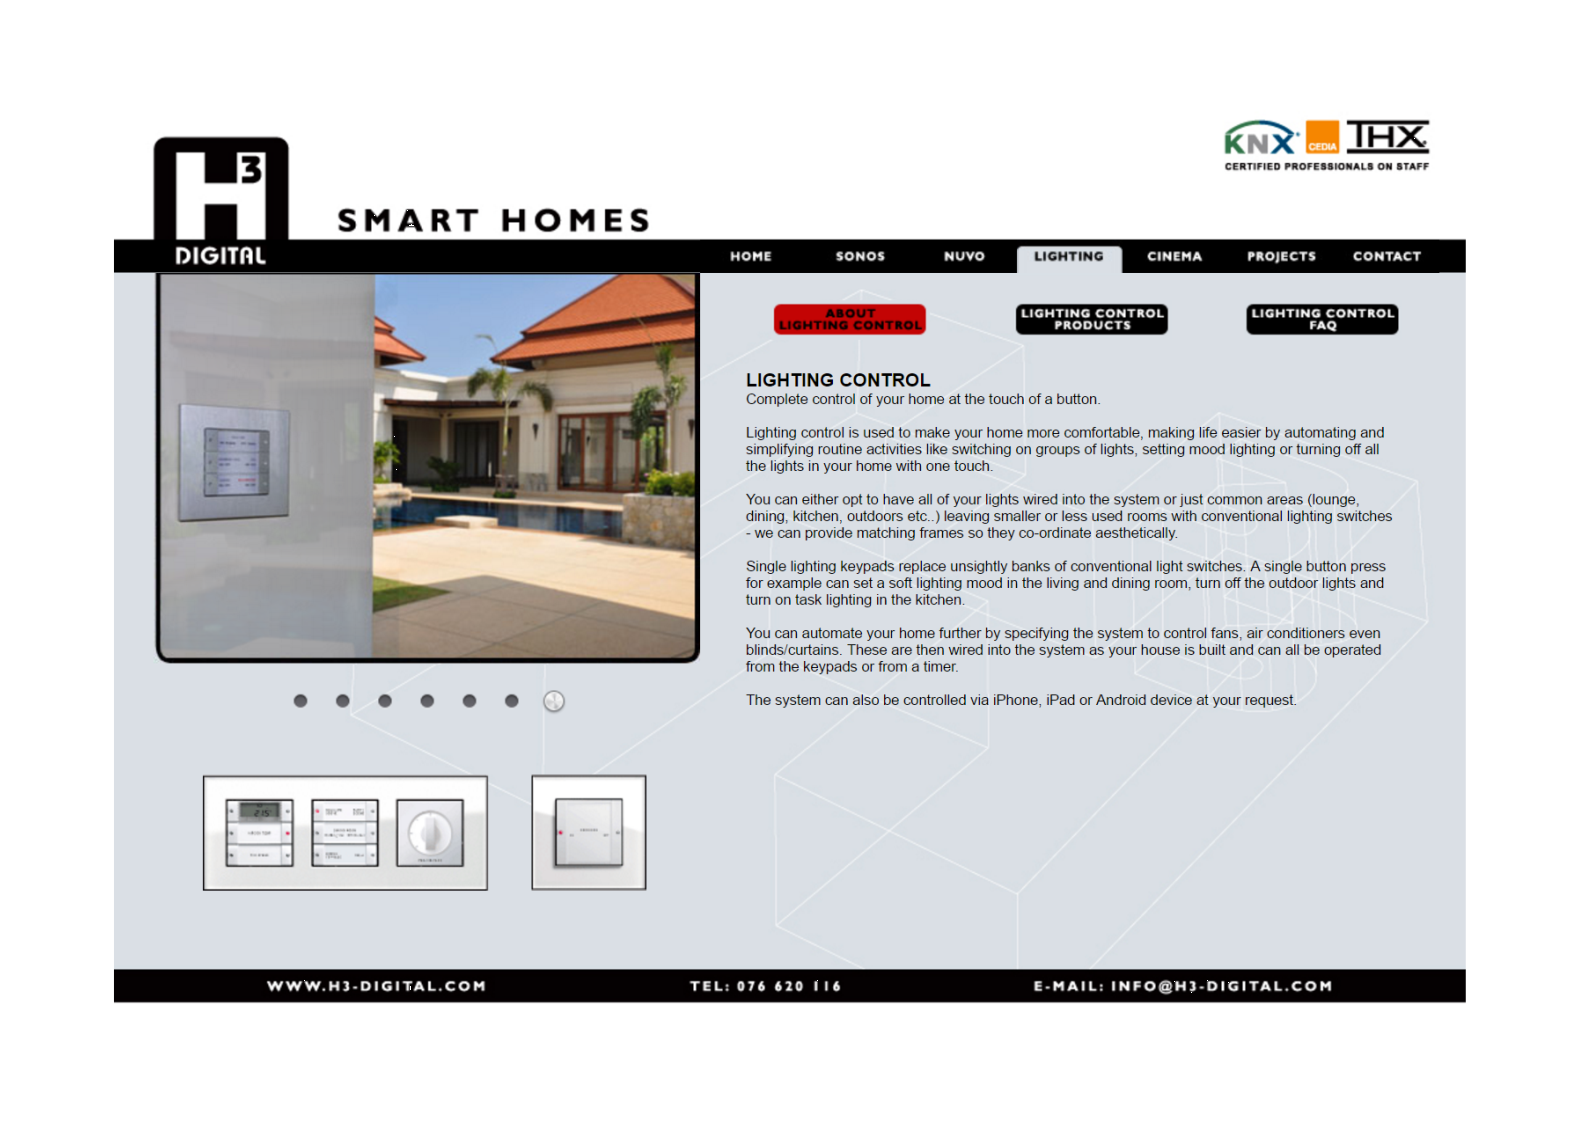 2012 Lighting control web page